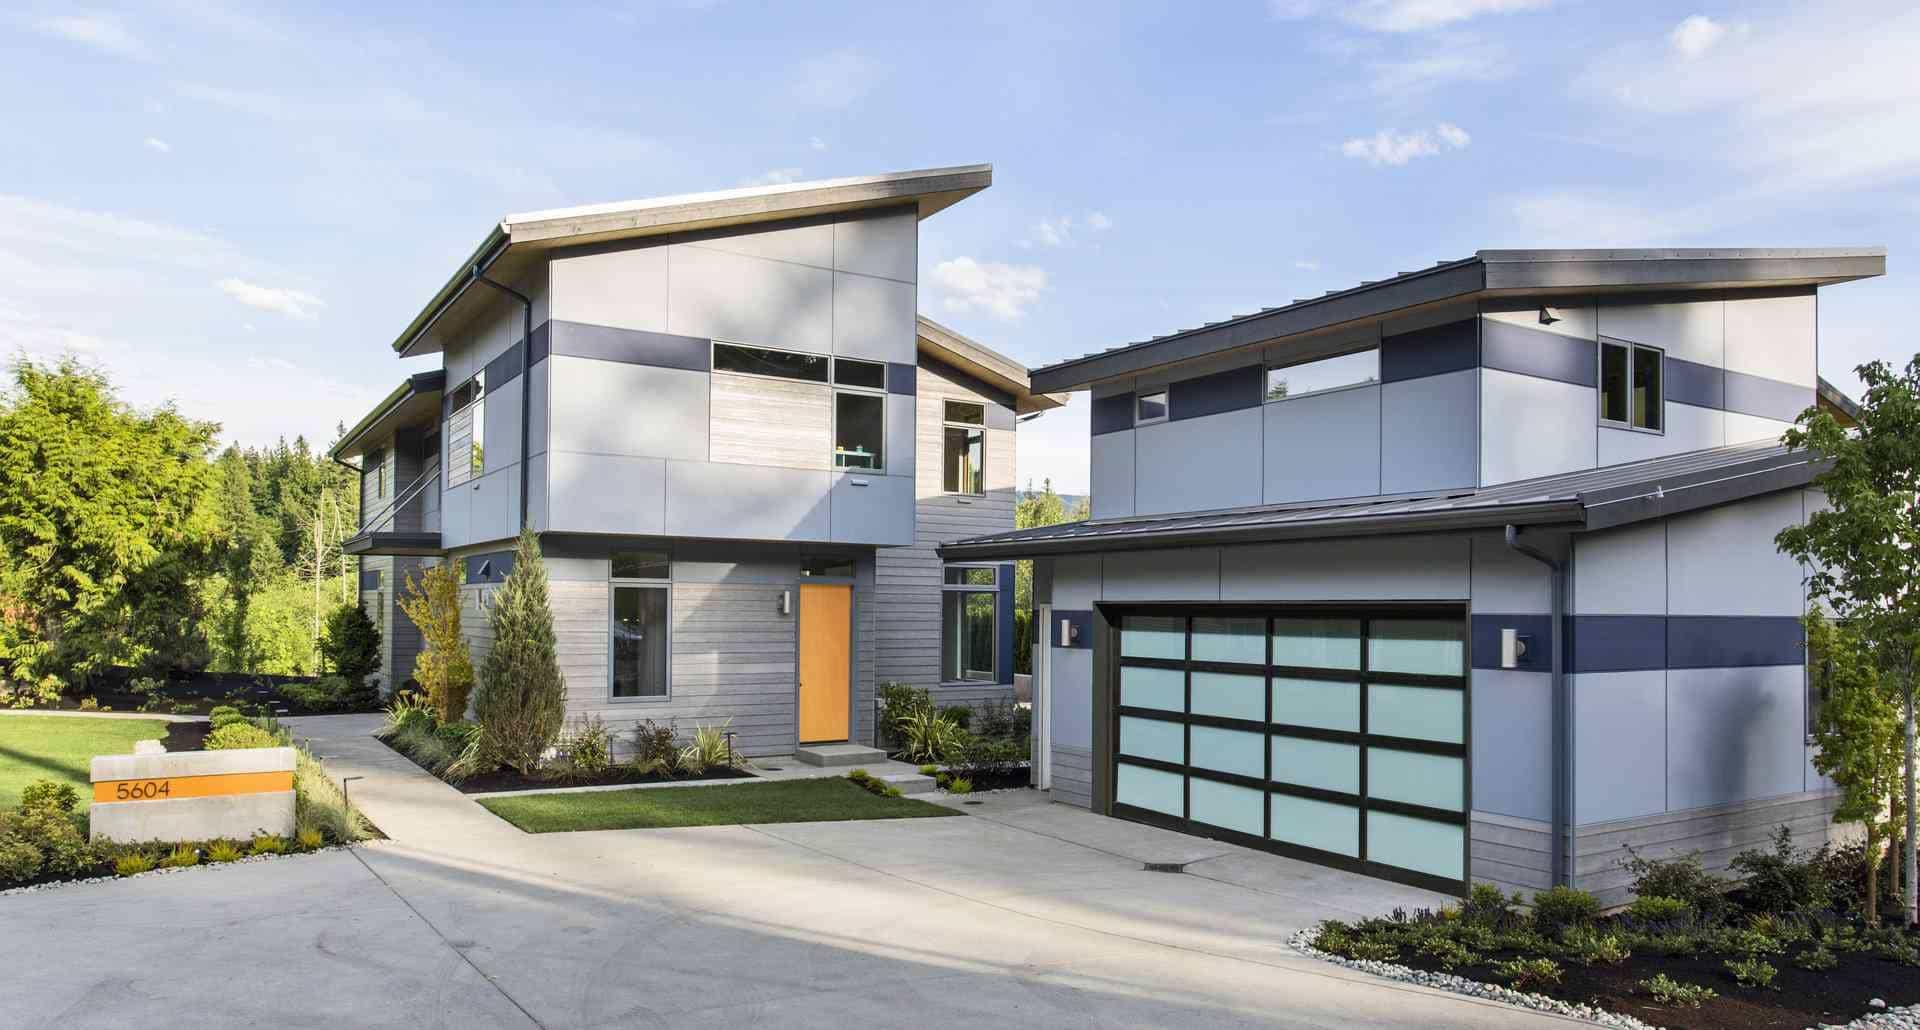 Real Estate Agent Des Moines